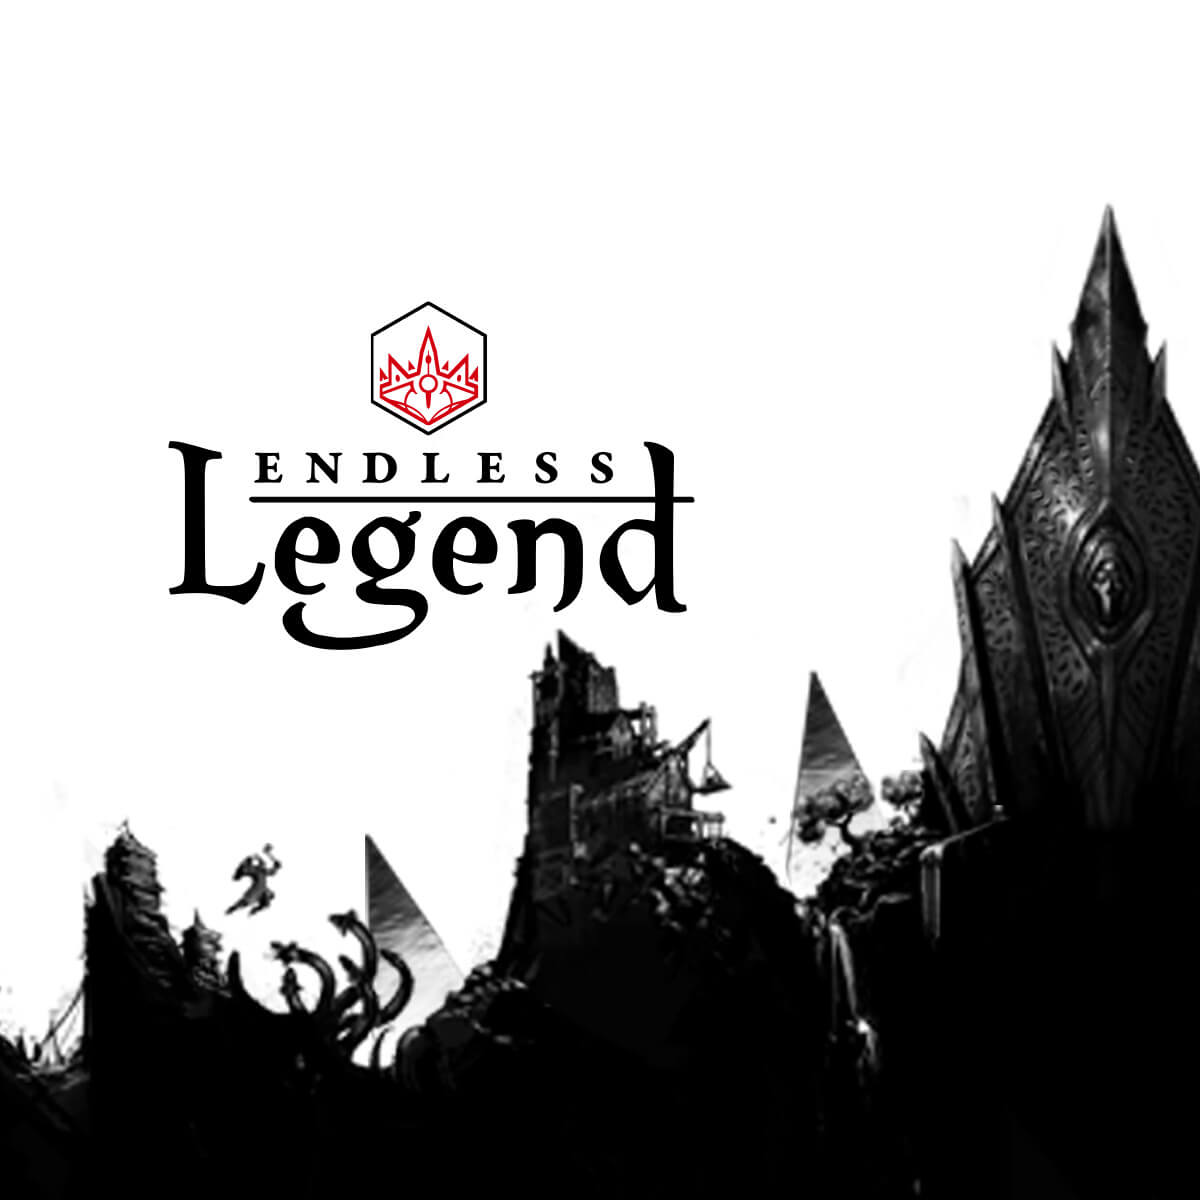 Map Creation Tutorial - Endless Legend